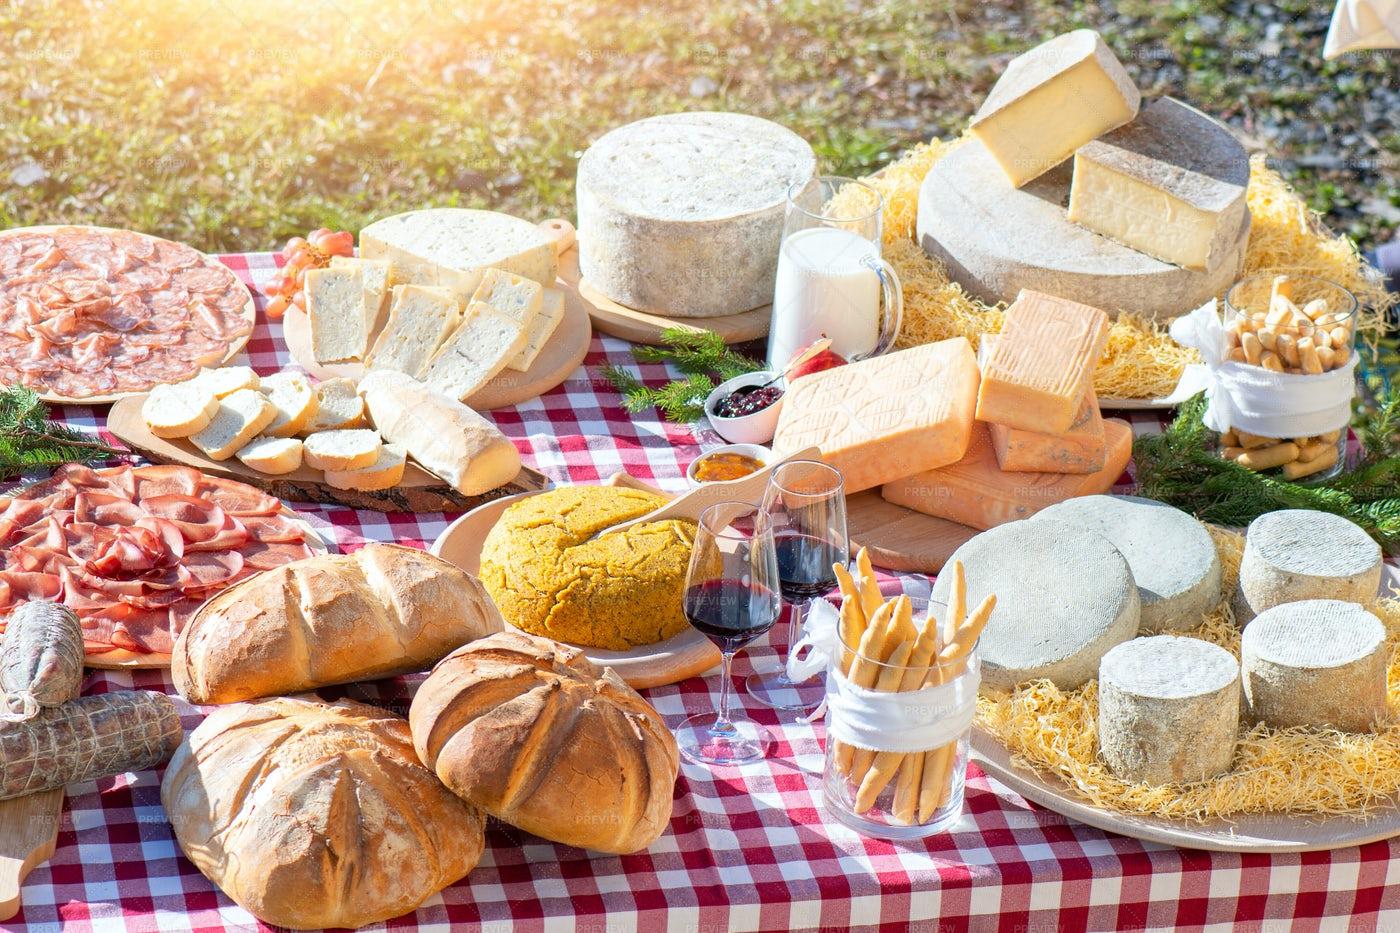 A Gourmet Picnic: Stock Photos